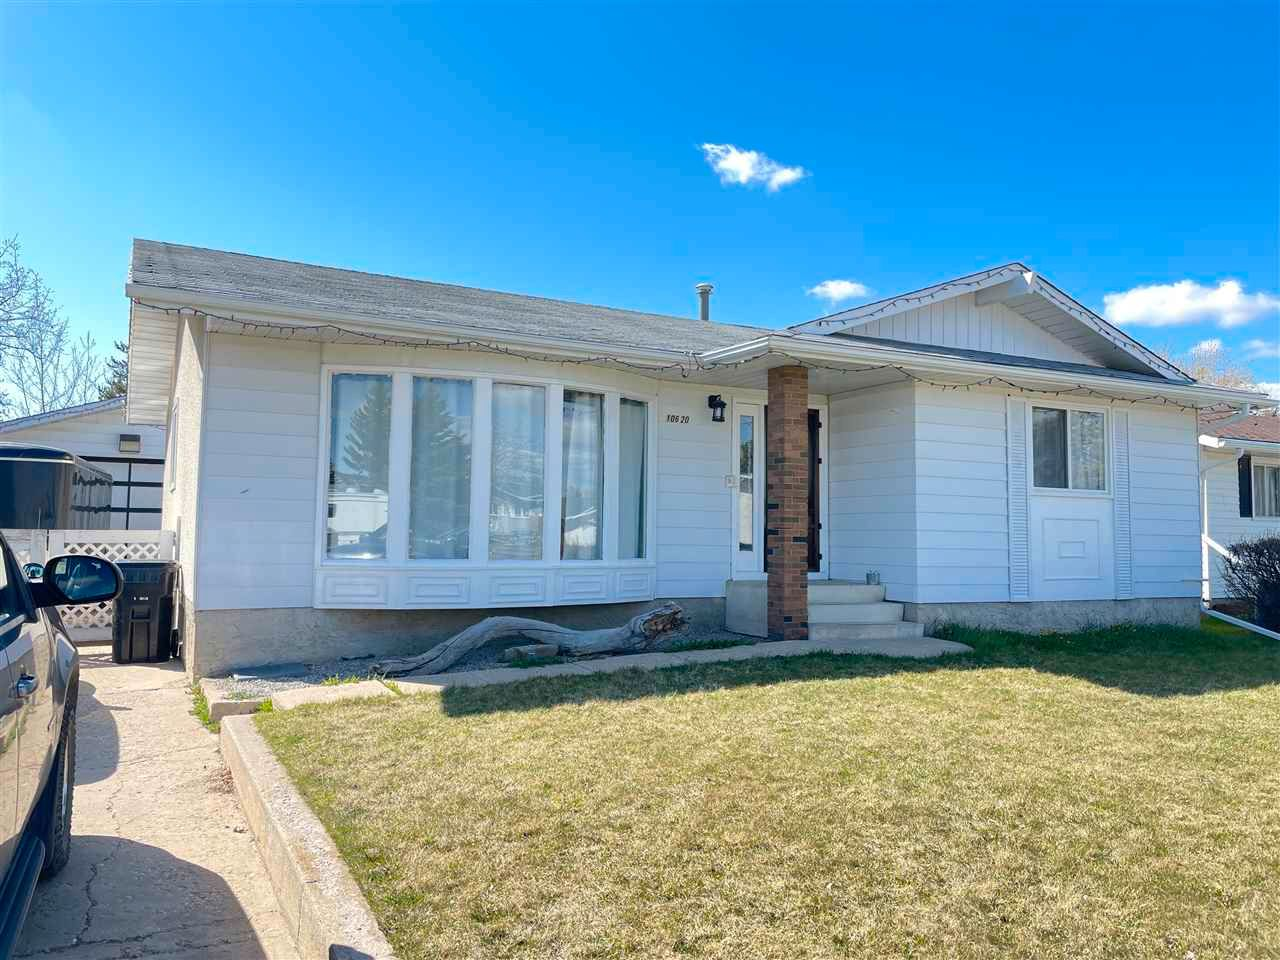 Main Photo: 10620 106 A Avenue: Westlock House for sale : MLS®# E4243334